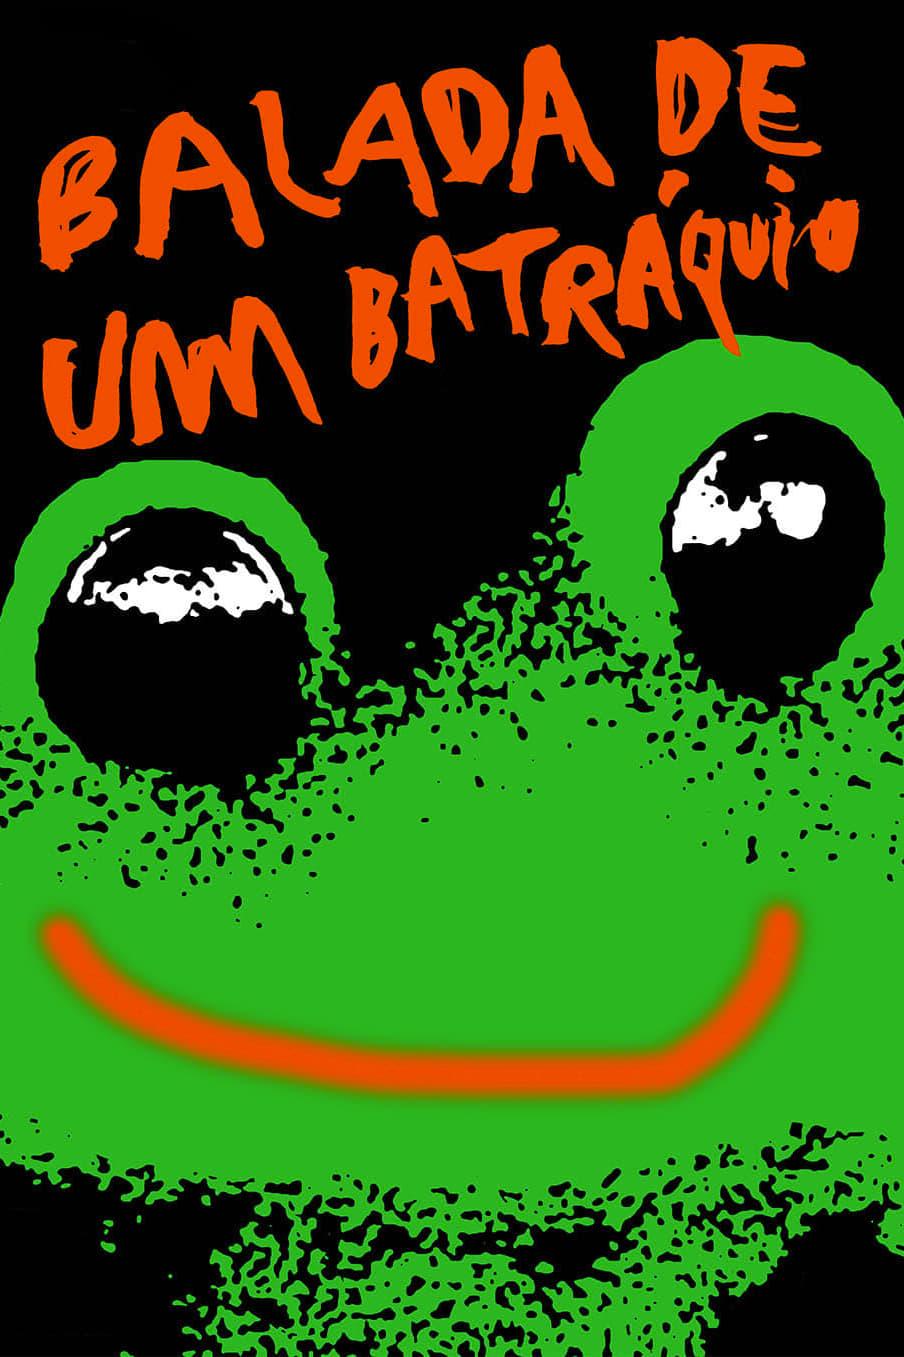 Batrachian's Ballad